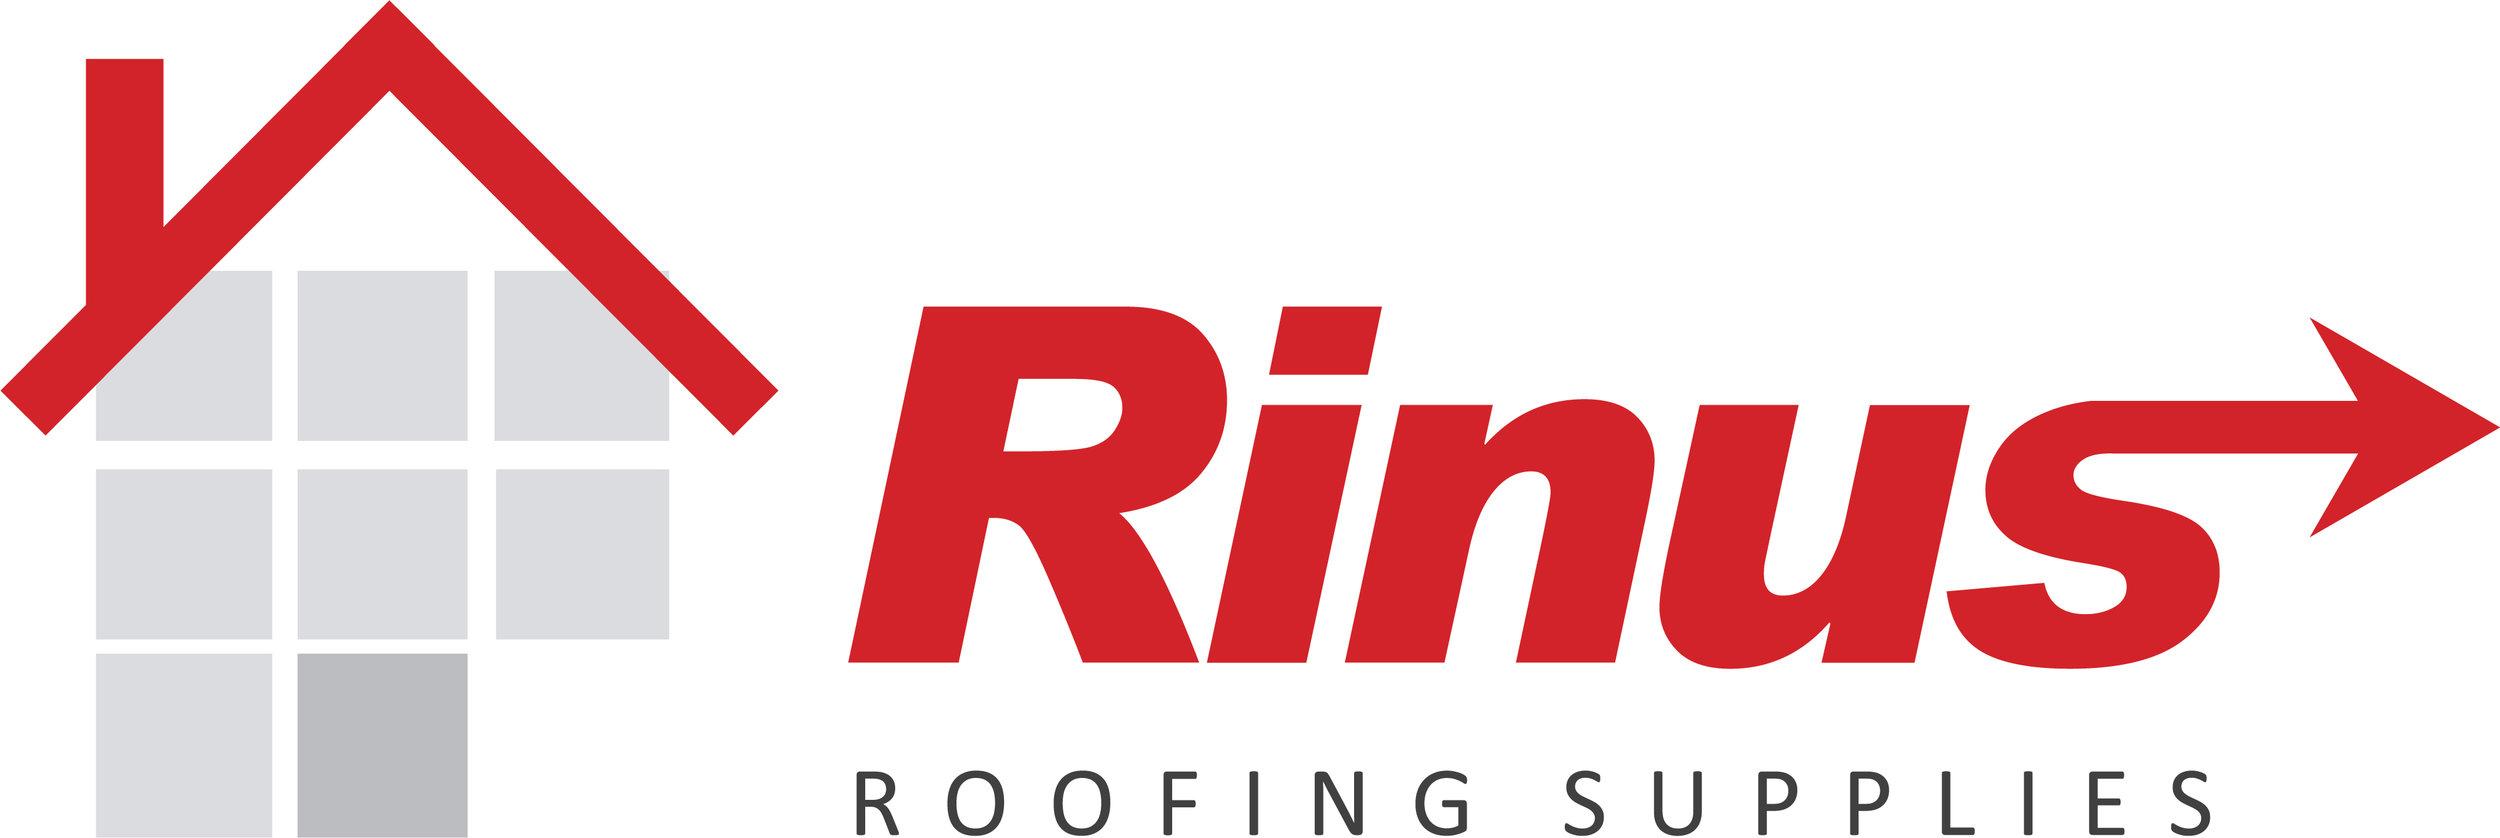 Rinus Roofing Supplies-01.jpg